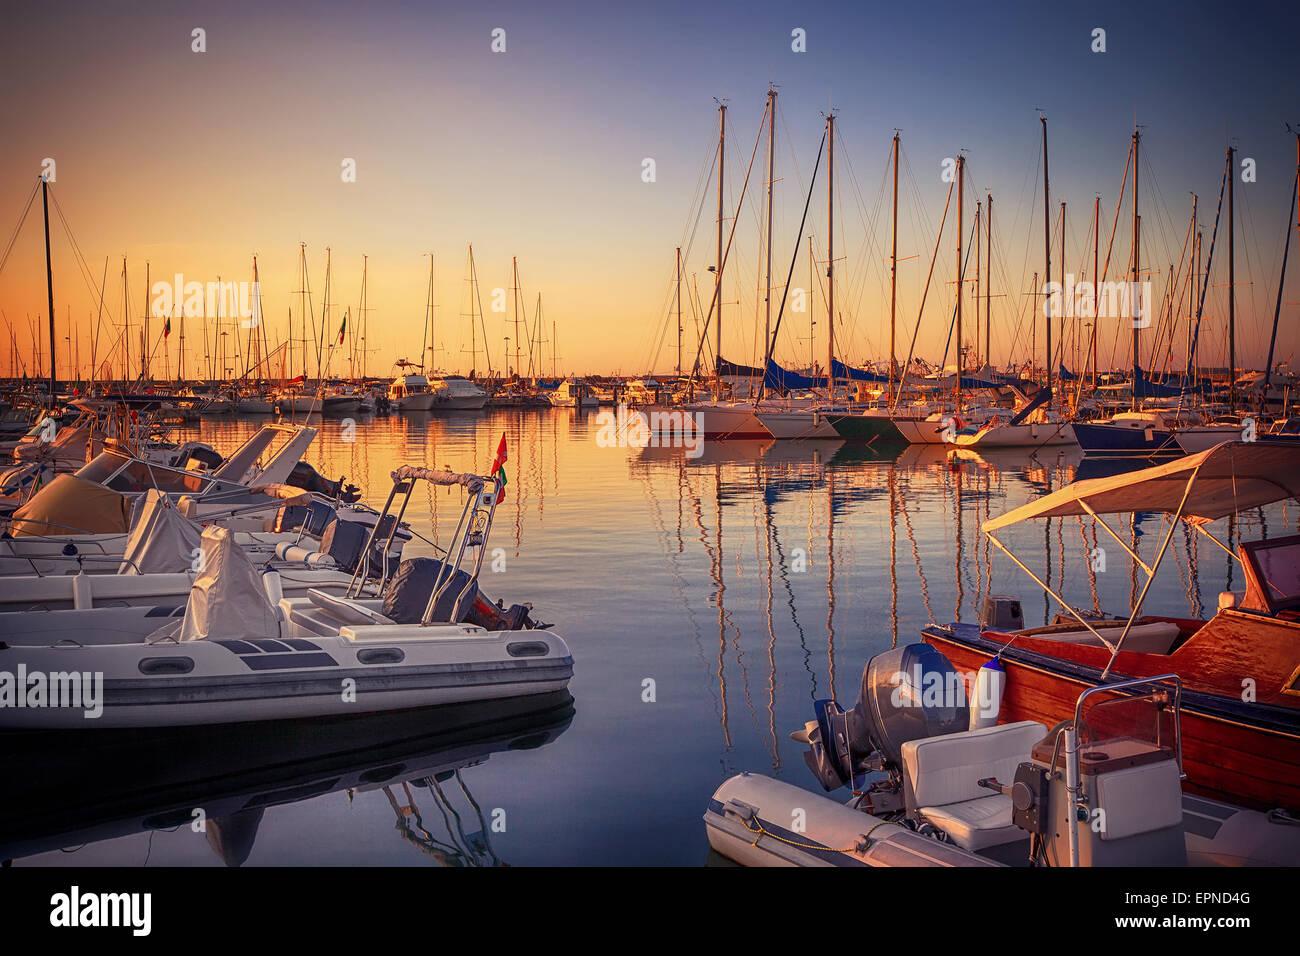 Marina with docked yachts at sunset - Stock Image